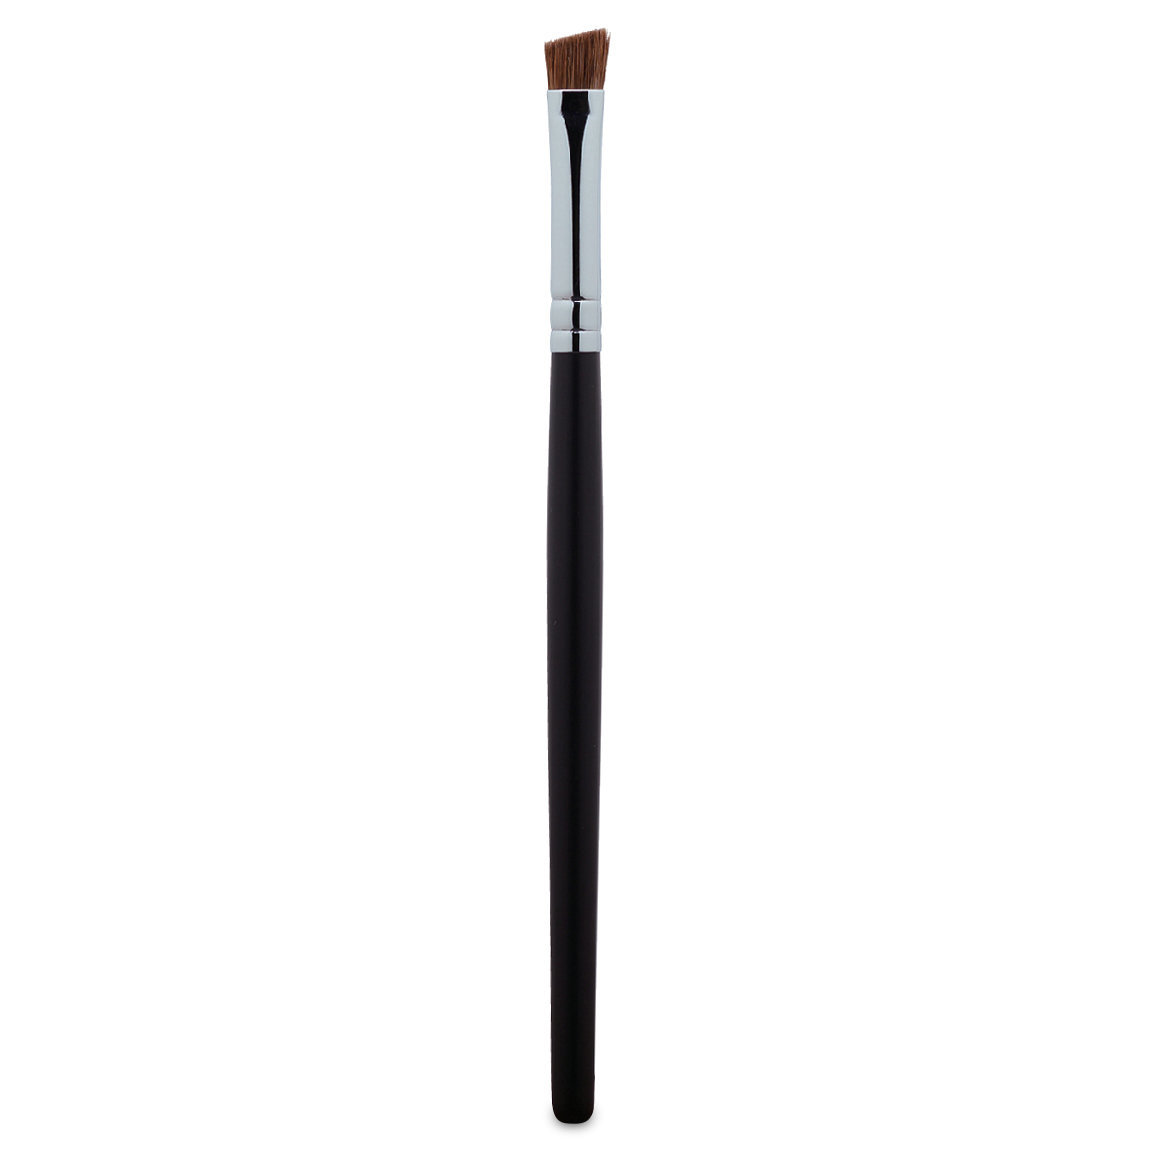 KOYUDO Casual Series C-41 Eyebrow Brush product swatch.